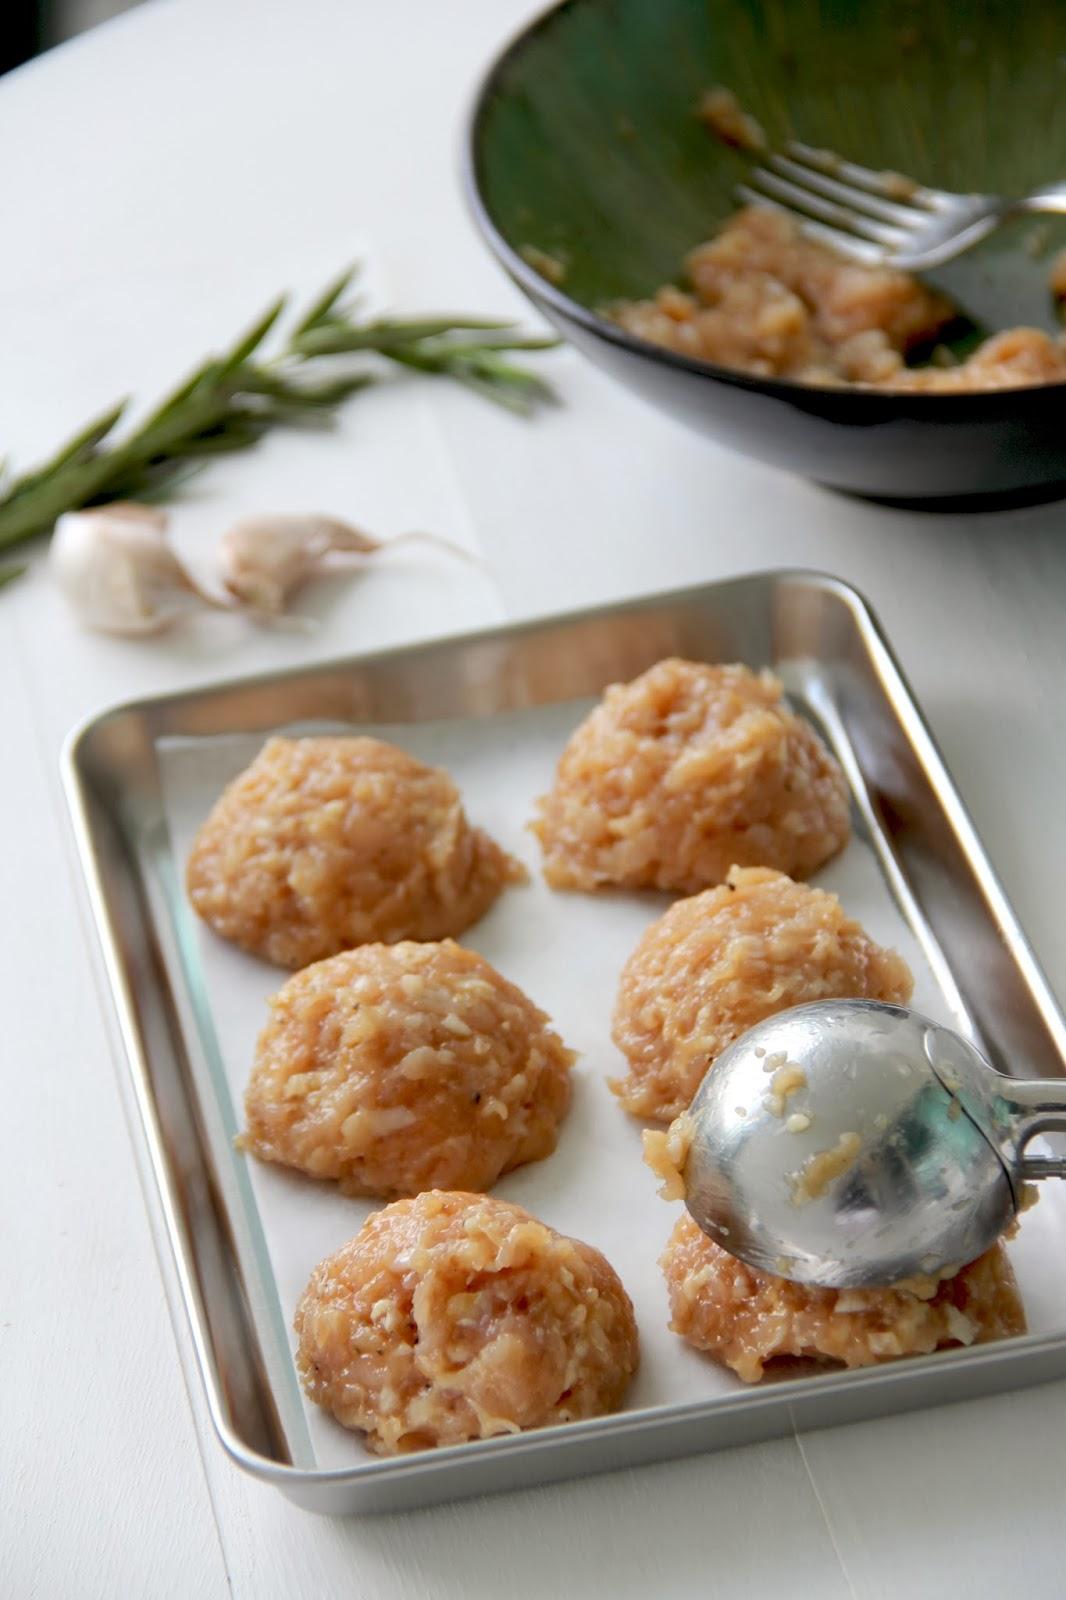 Fashion Gourmet: Gwyneth Paltrow's Japanese Chicken Meatballs